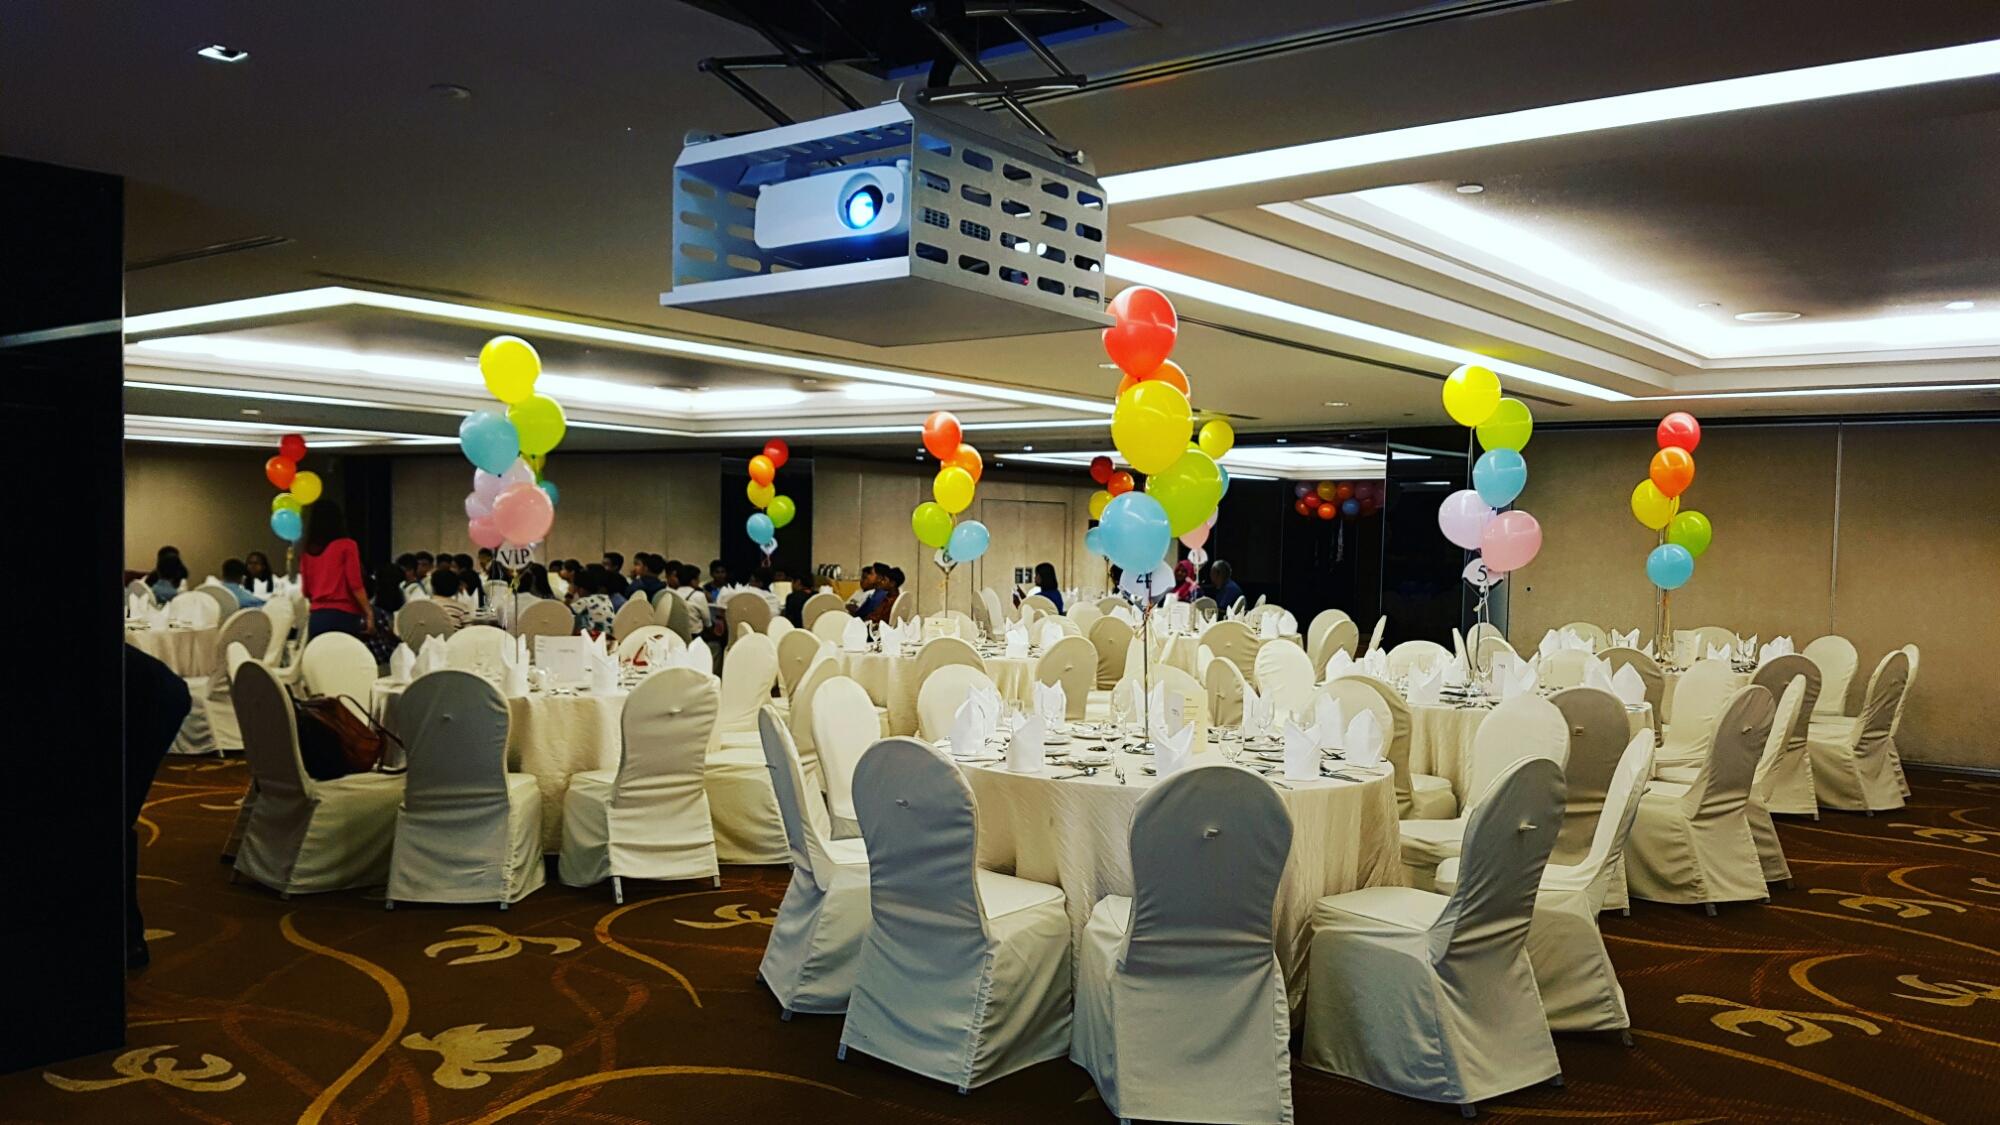 , ?Helium balloon decoration Singapore, Singapore Balloon Decoration Services - Balloon Workshop and Balloon Sculpting